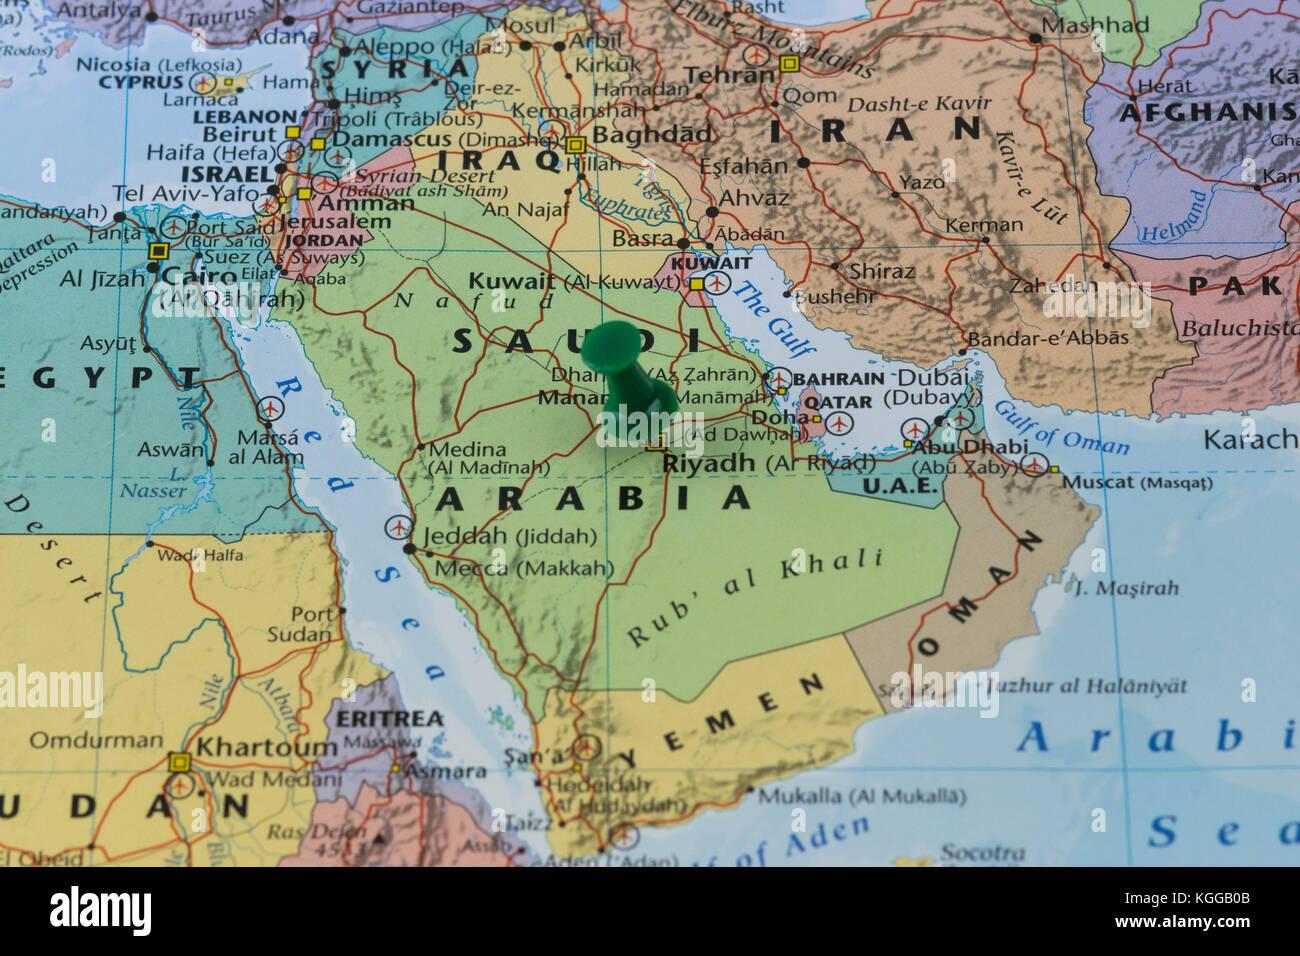 Riyadh pinned on a map of Saudi